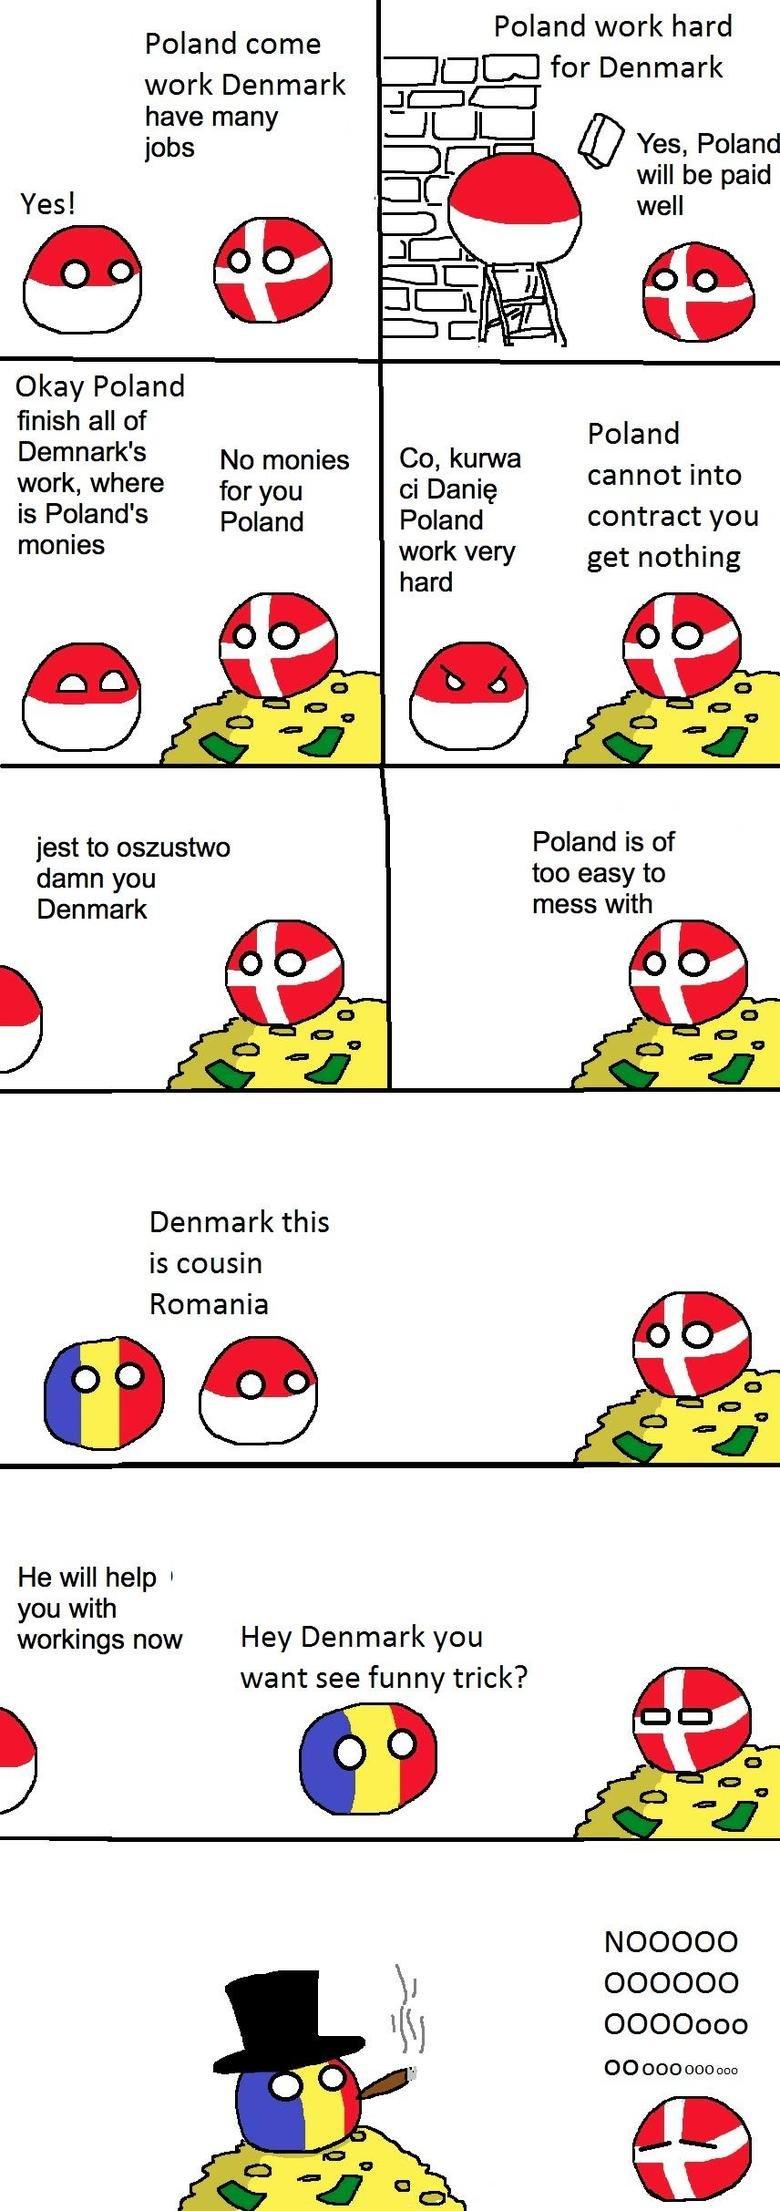 Always a reason to be proud of my countr. Found on imgur. Poland work hard DC] for Denmark Poland come work Denmark have many - e pal F well Okay Poland N . C k Polandball romania denmark